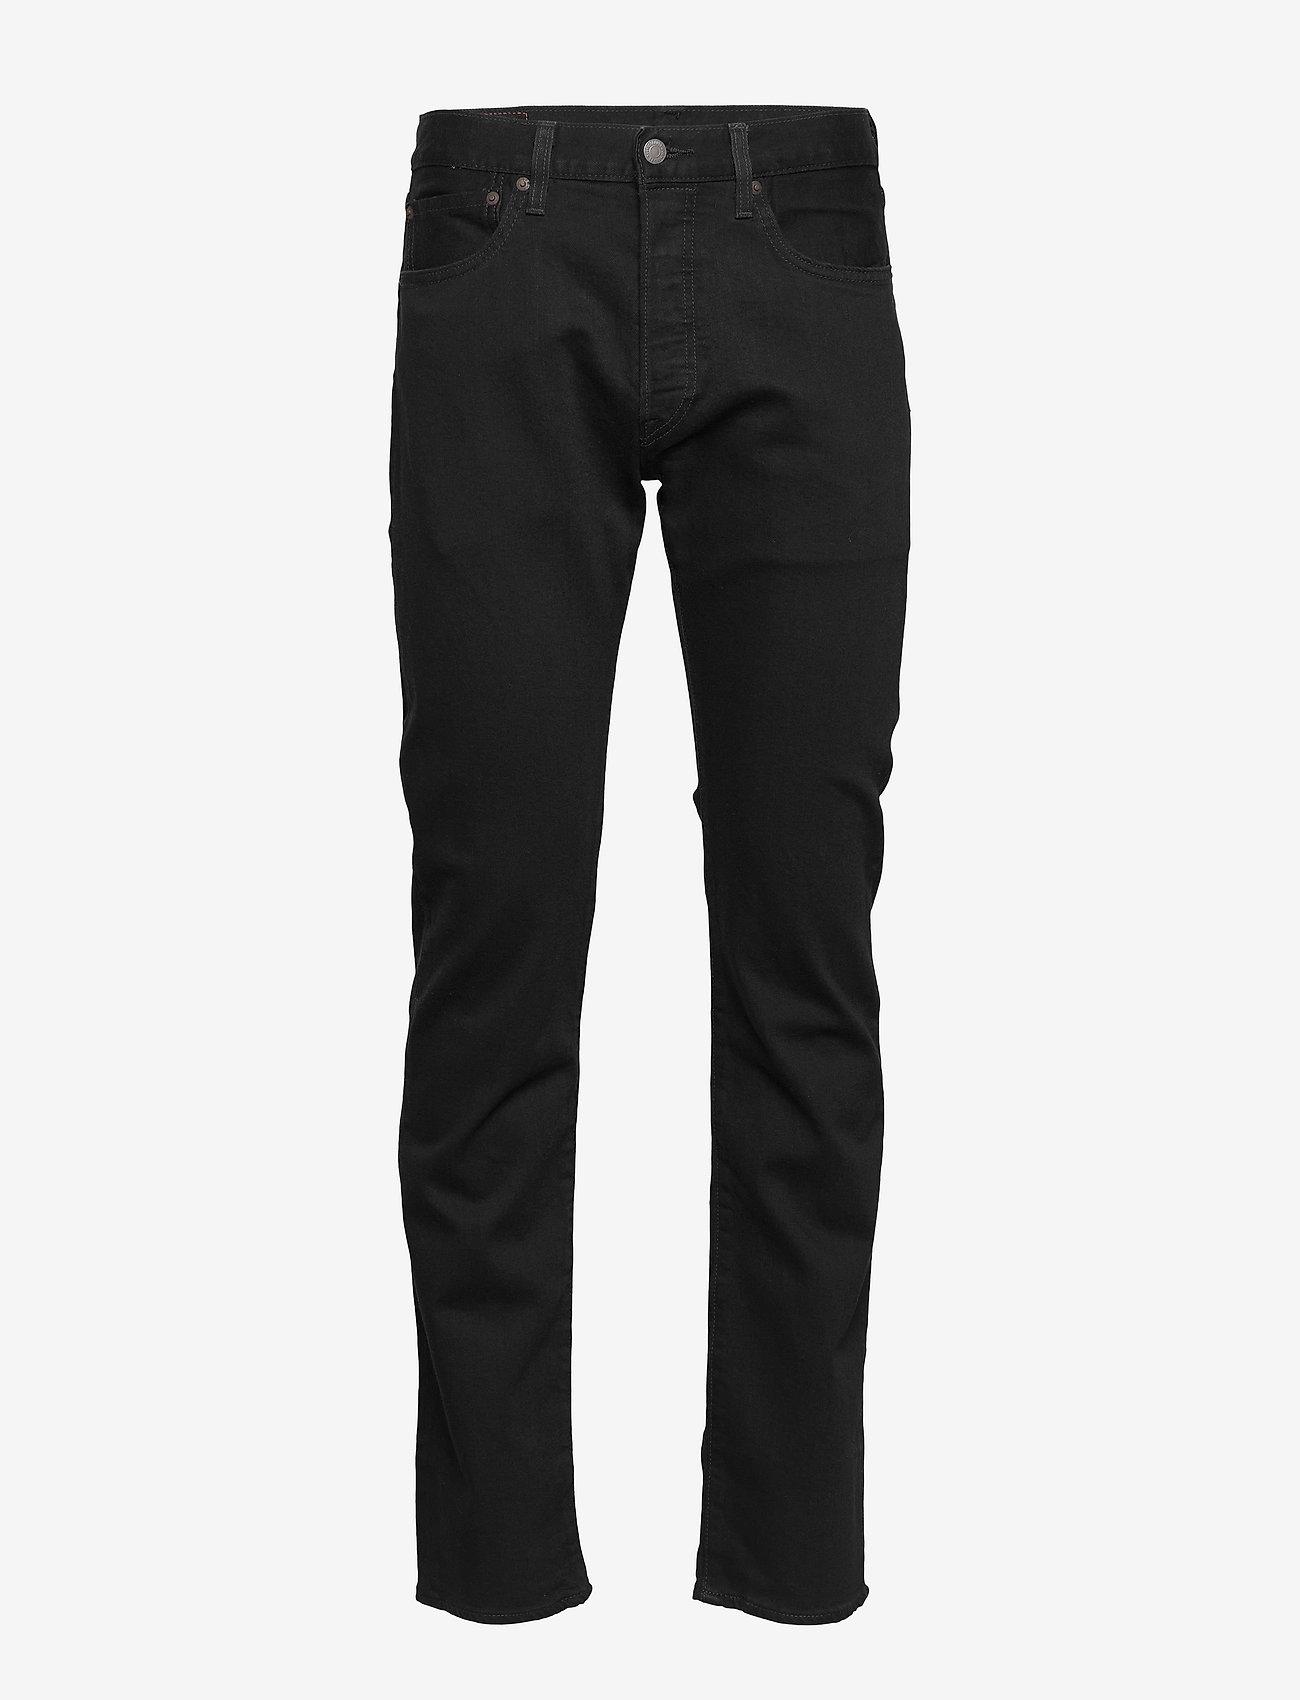 LEVI´S Men - 501 LEVISORIGINAL STAND ALONE - regular jeans - blacks - 1